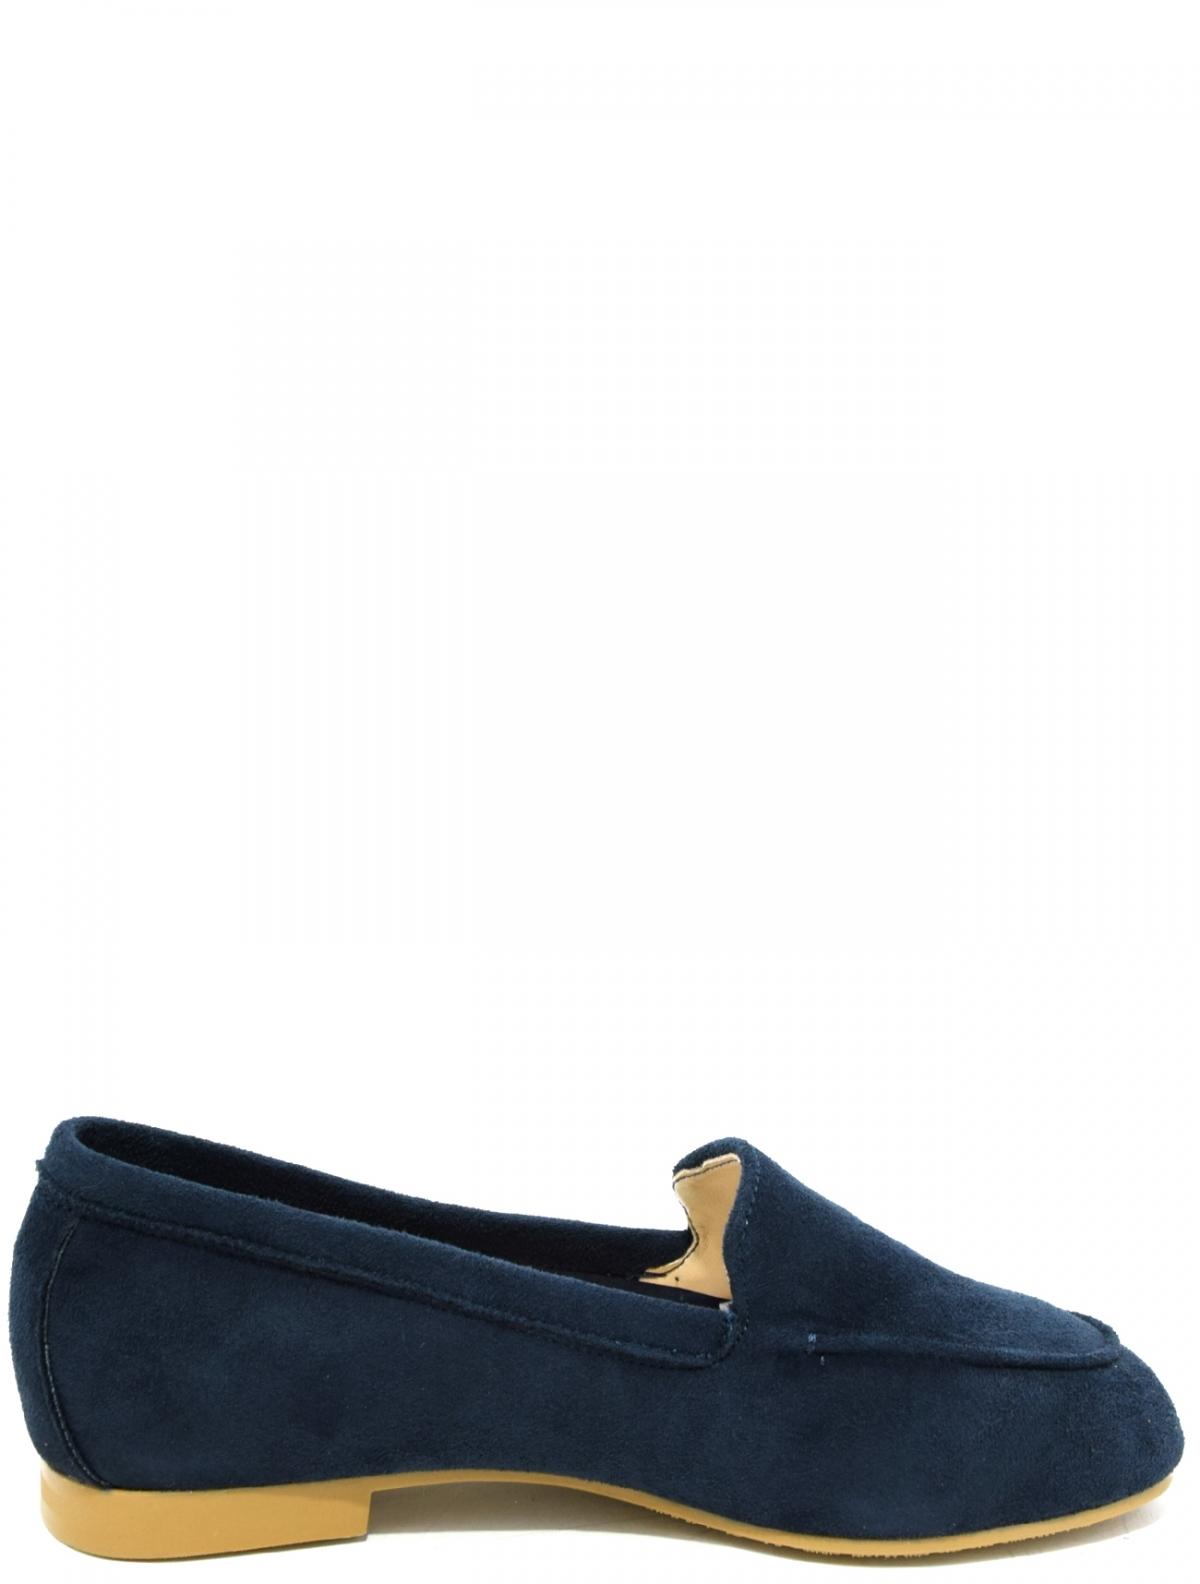 AIDINI TREND 1143-171-721D женские туфли